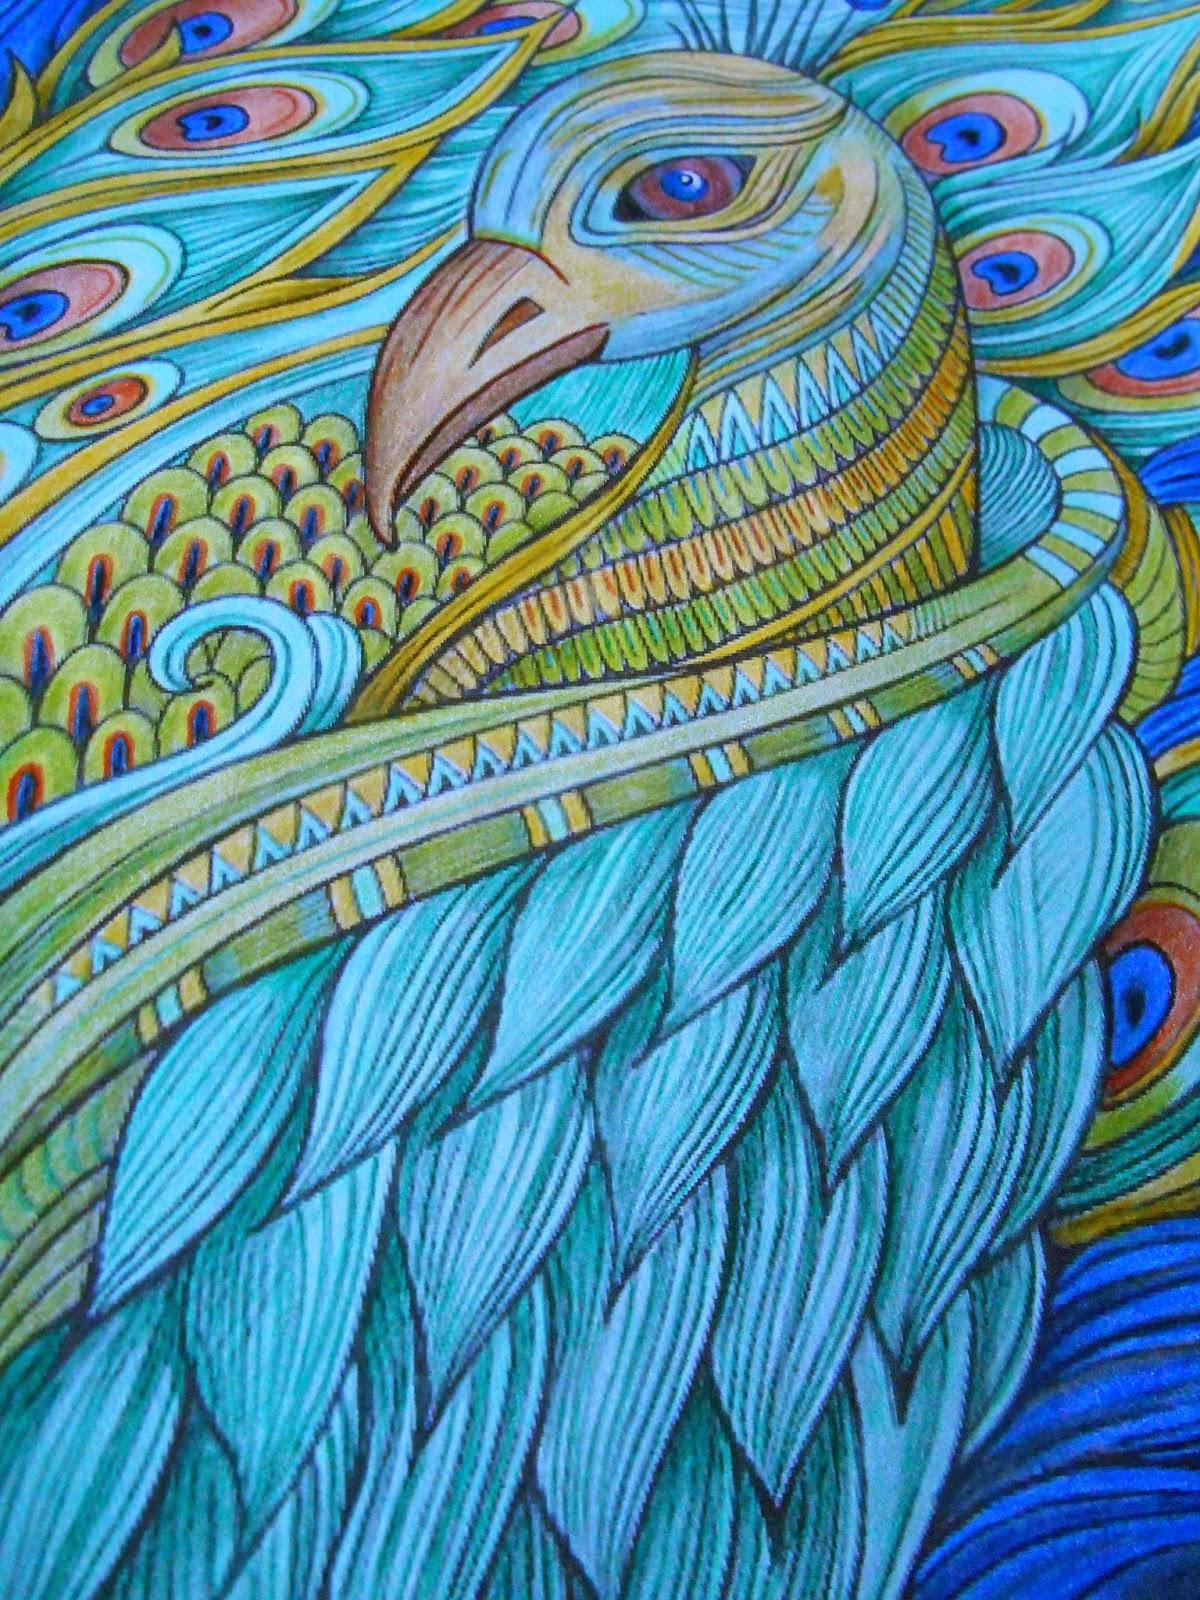 Mandala Kleurplaten Pauw.Kleurvitality Nessy S Artwork Wat Een Pauw